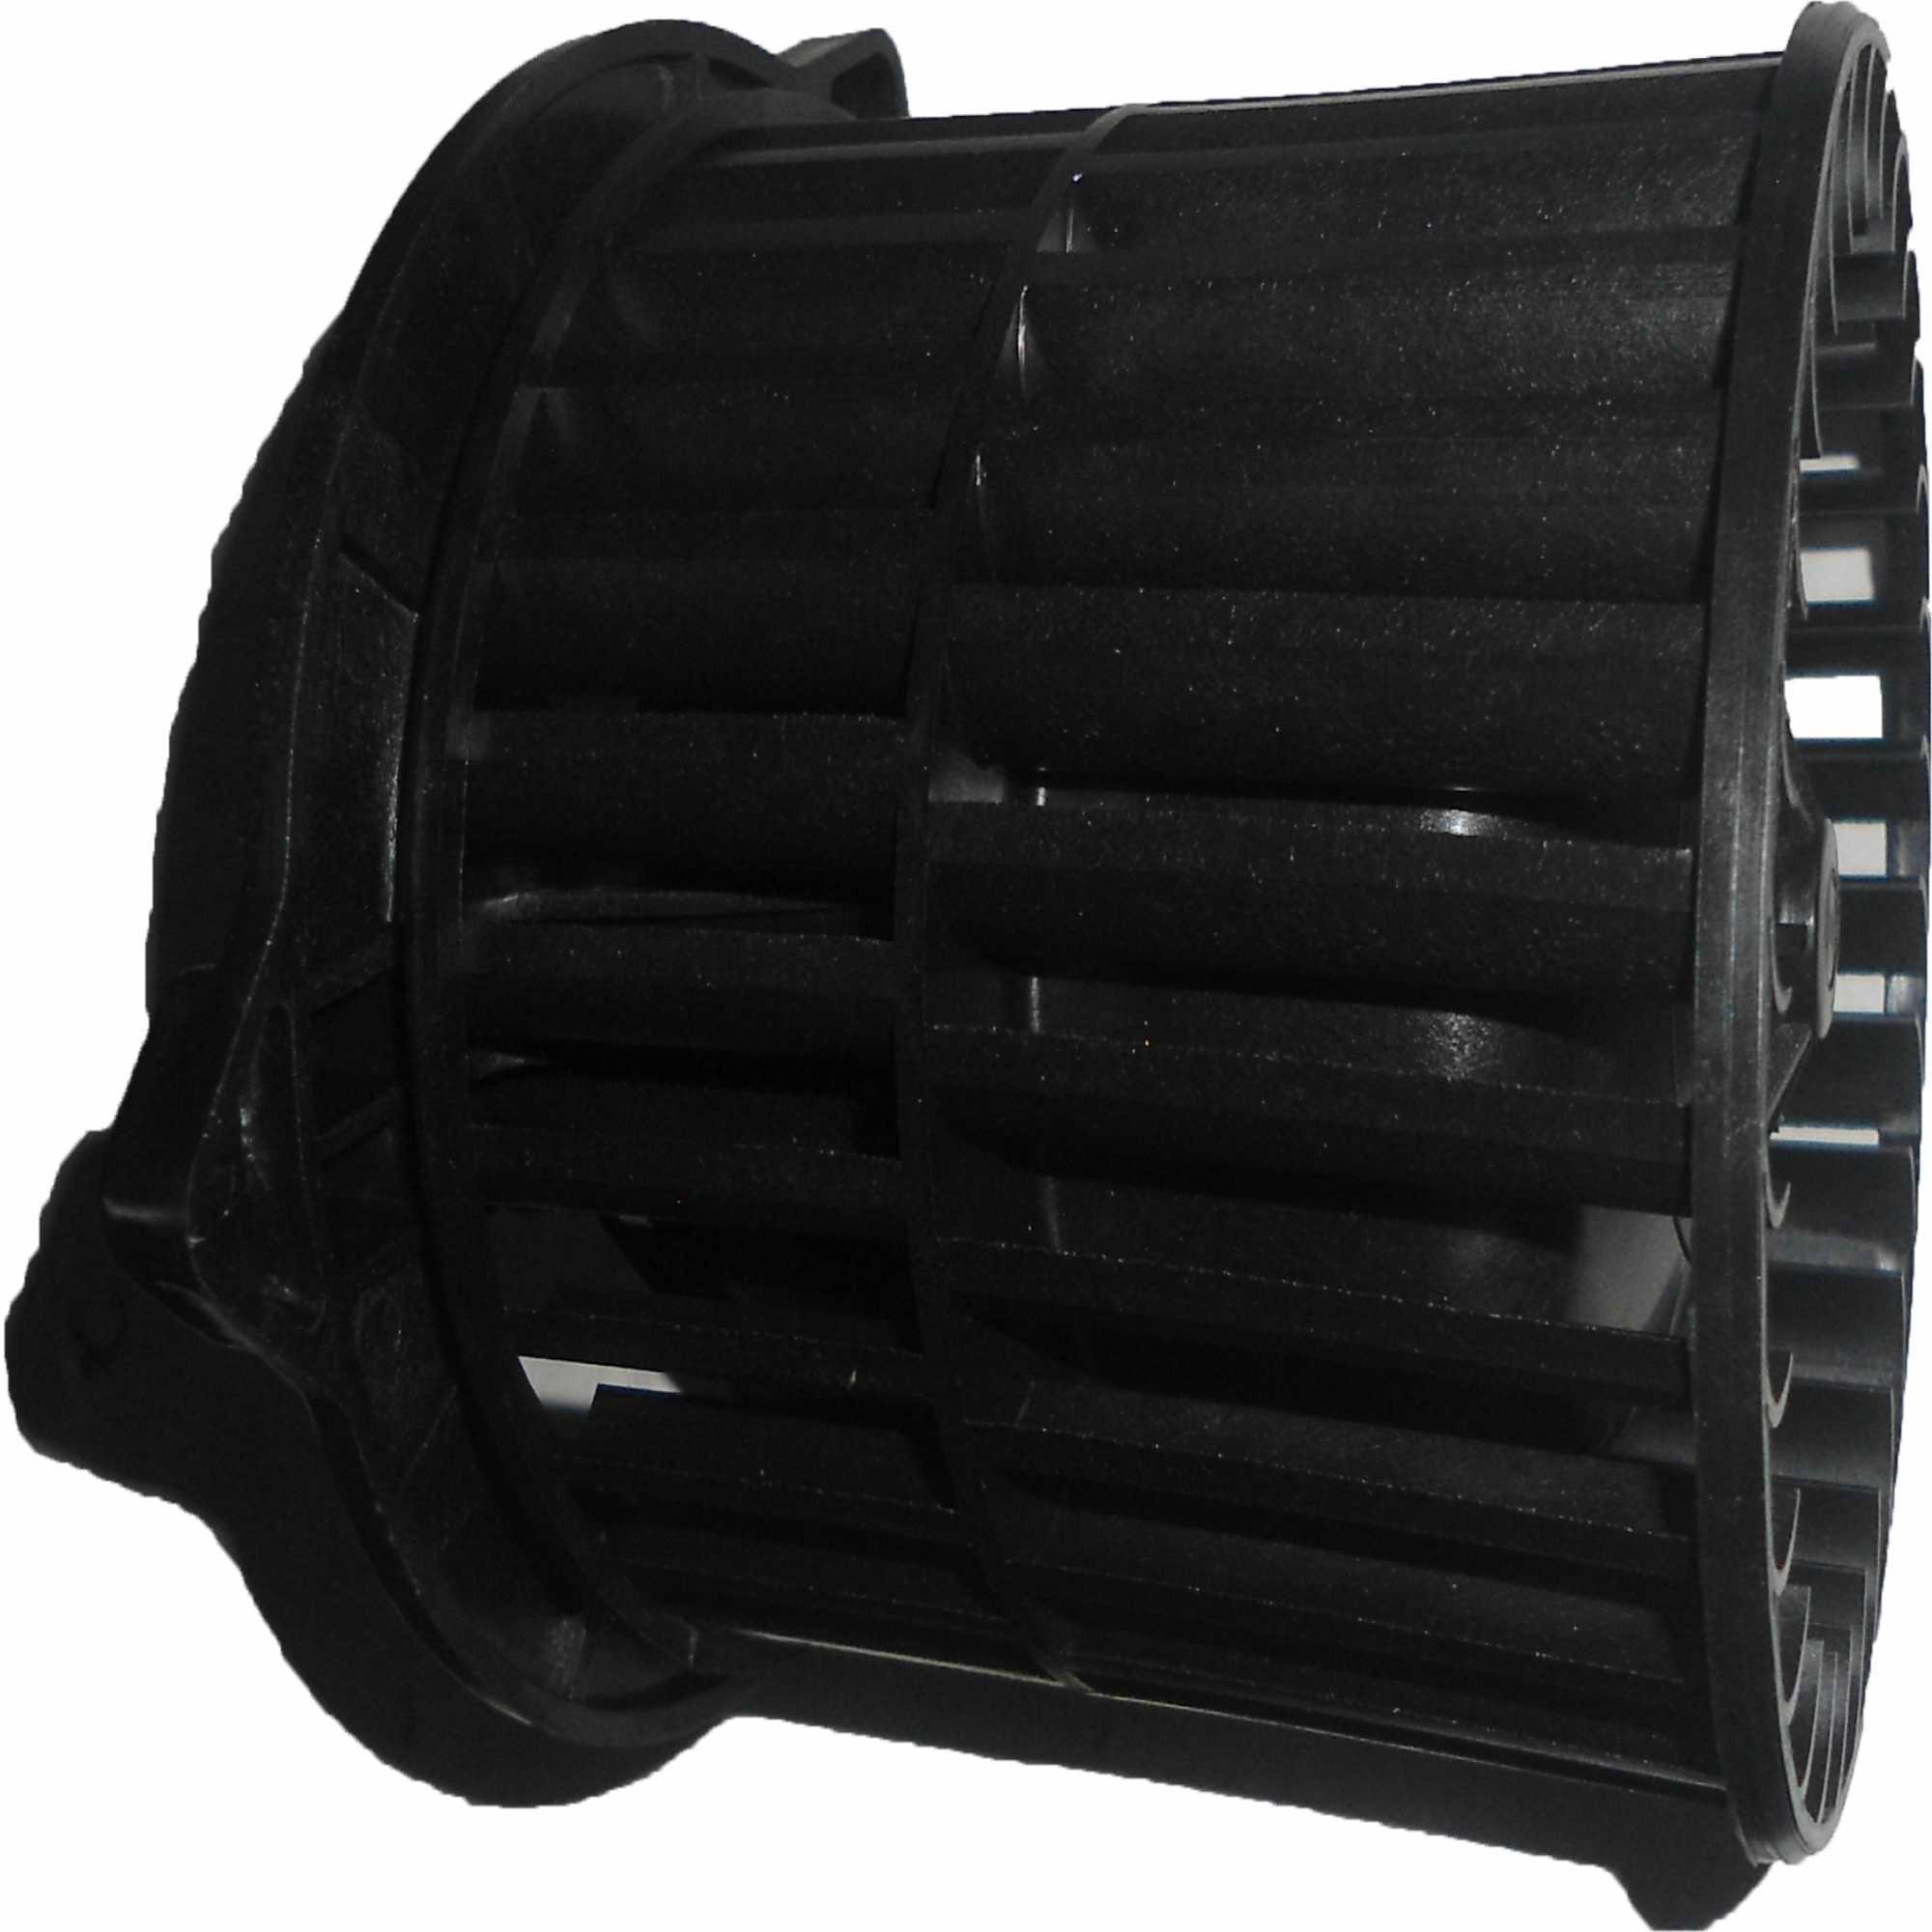 Motor Caixa Evaporadora - Uno Mille/Fiorino C/Ar